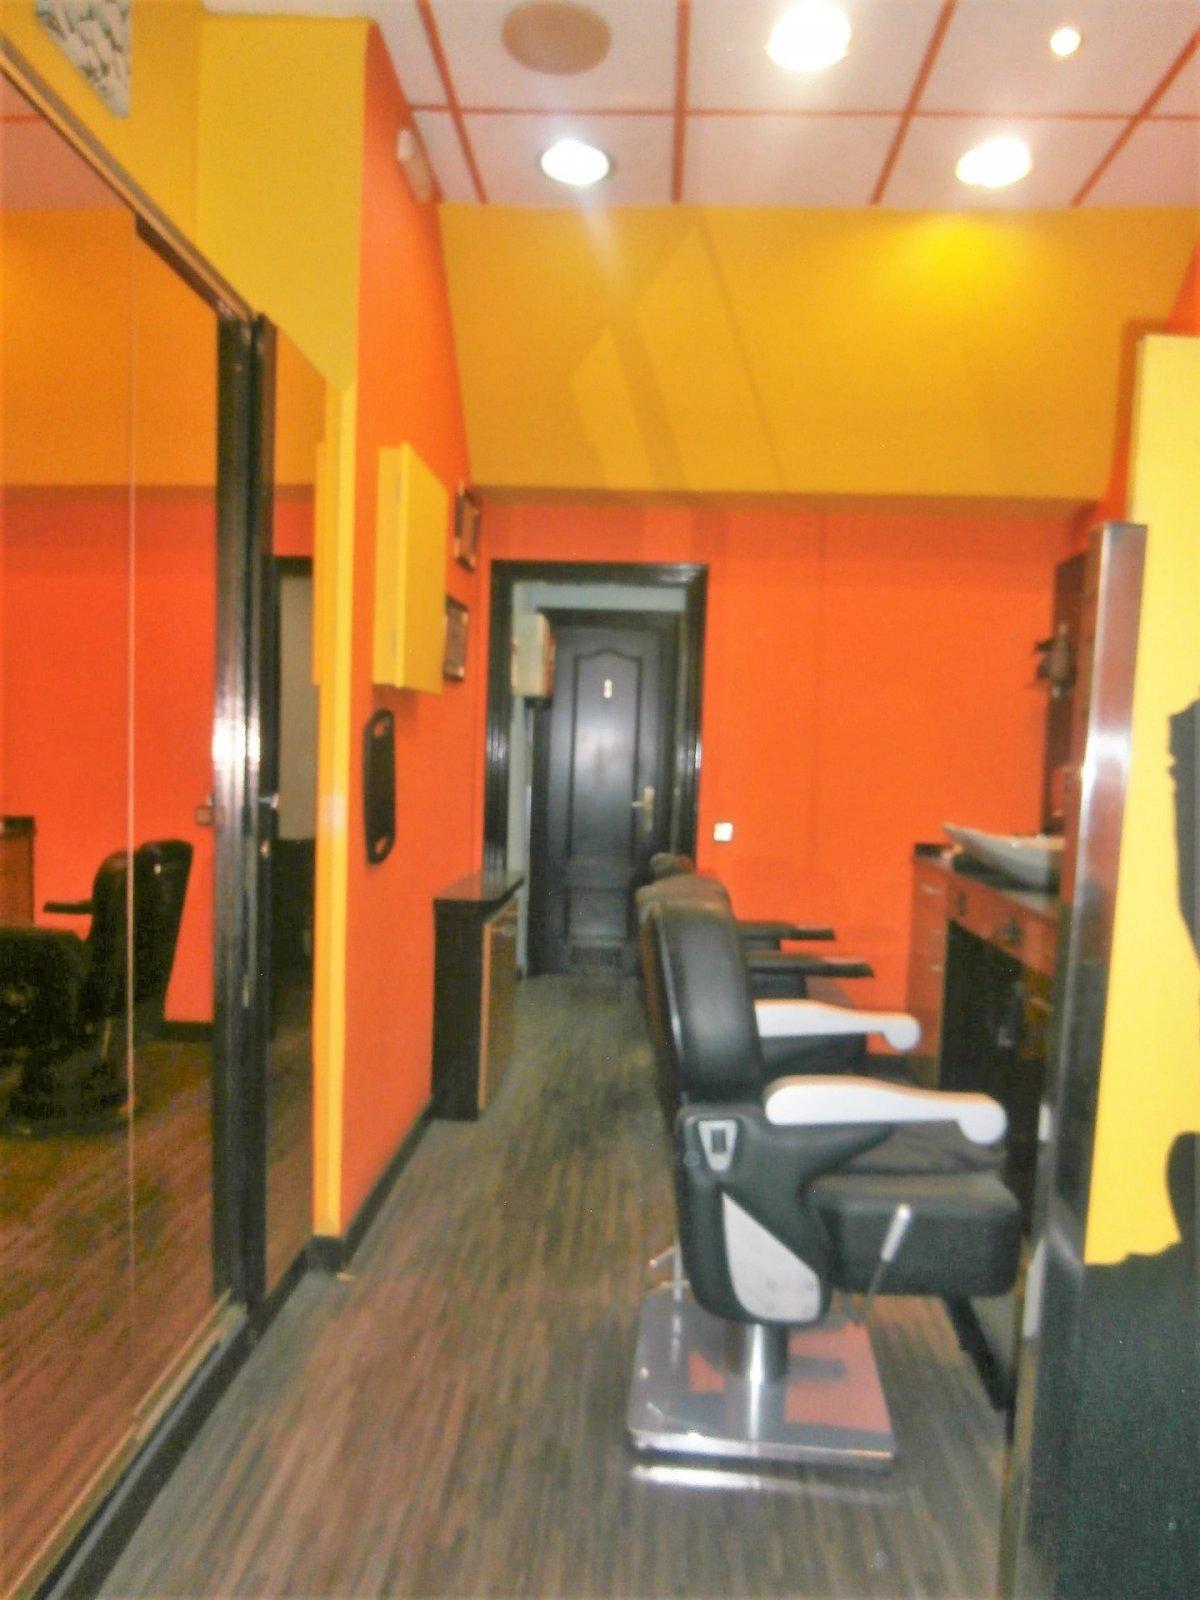 Local instalado como peluqueria - imagenInmueble5